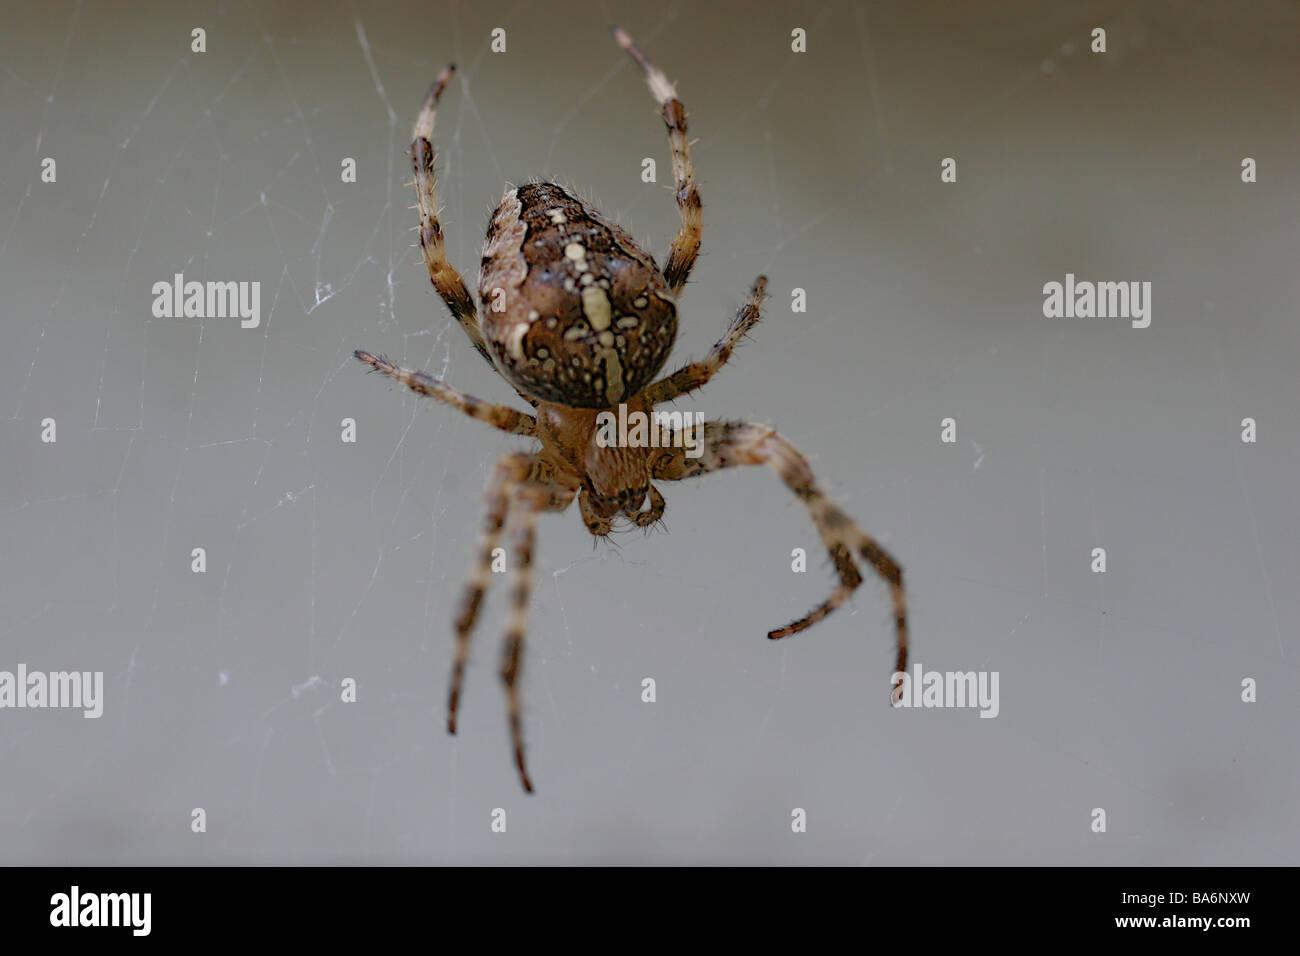 Cross-spider Araneus diadematus fuzziness nature animal spider arachnid Webspinne wheel-net-spider Araneidae concept - Stock Image